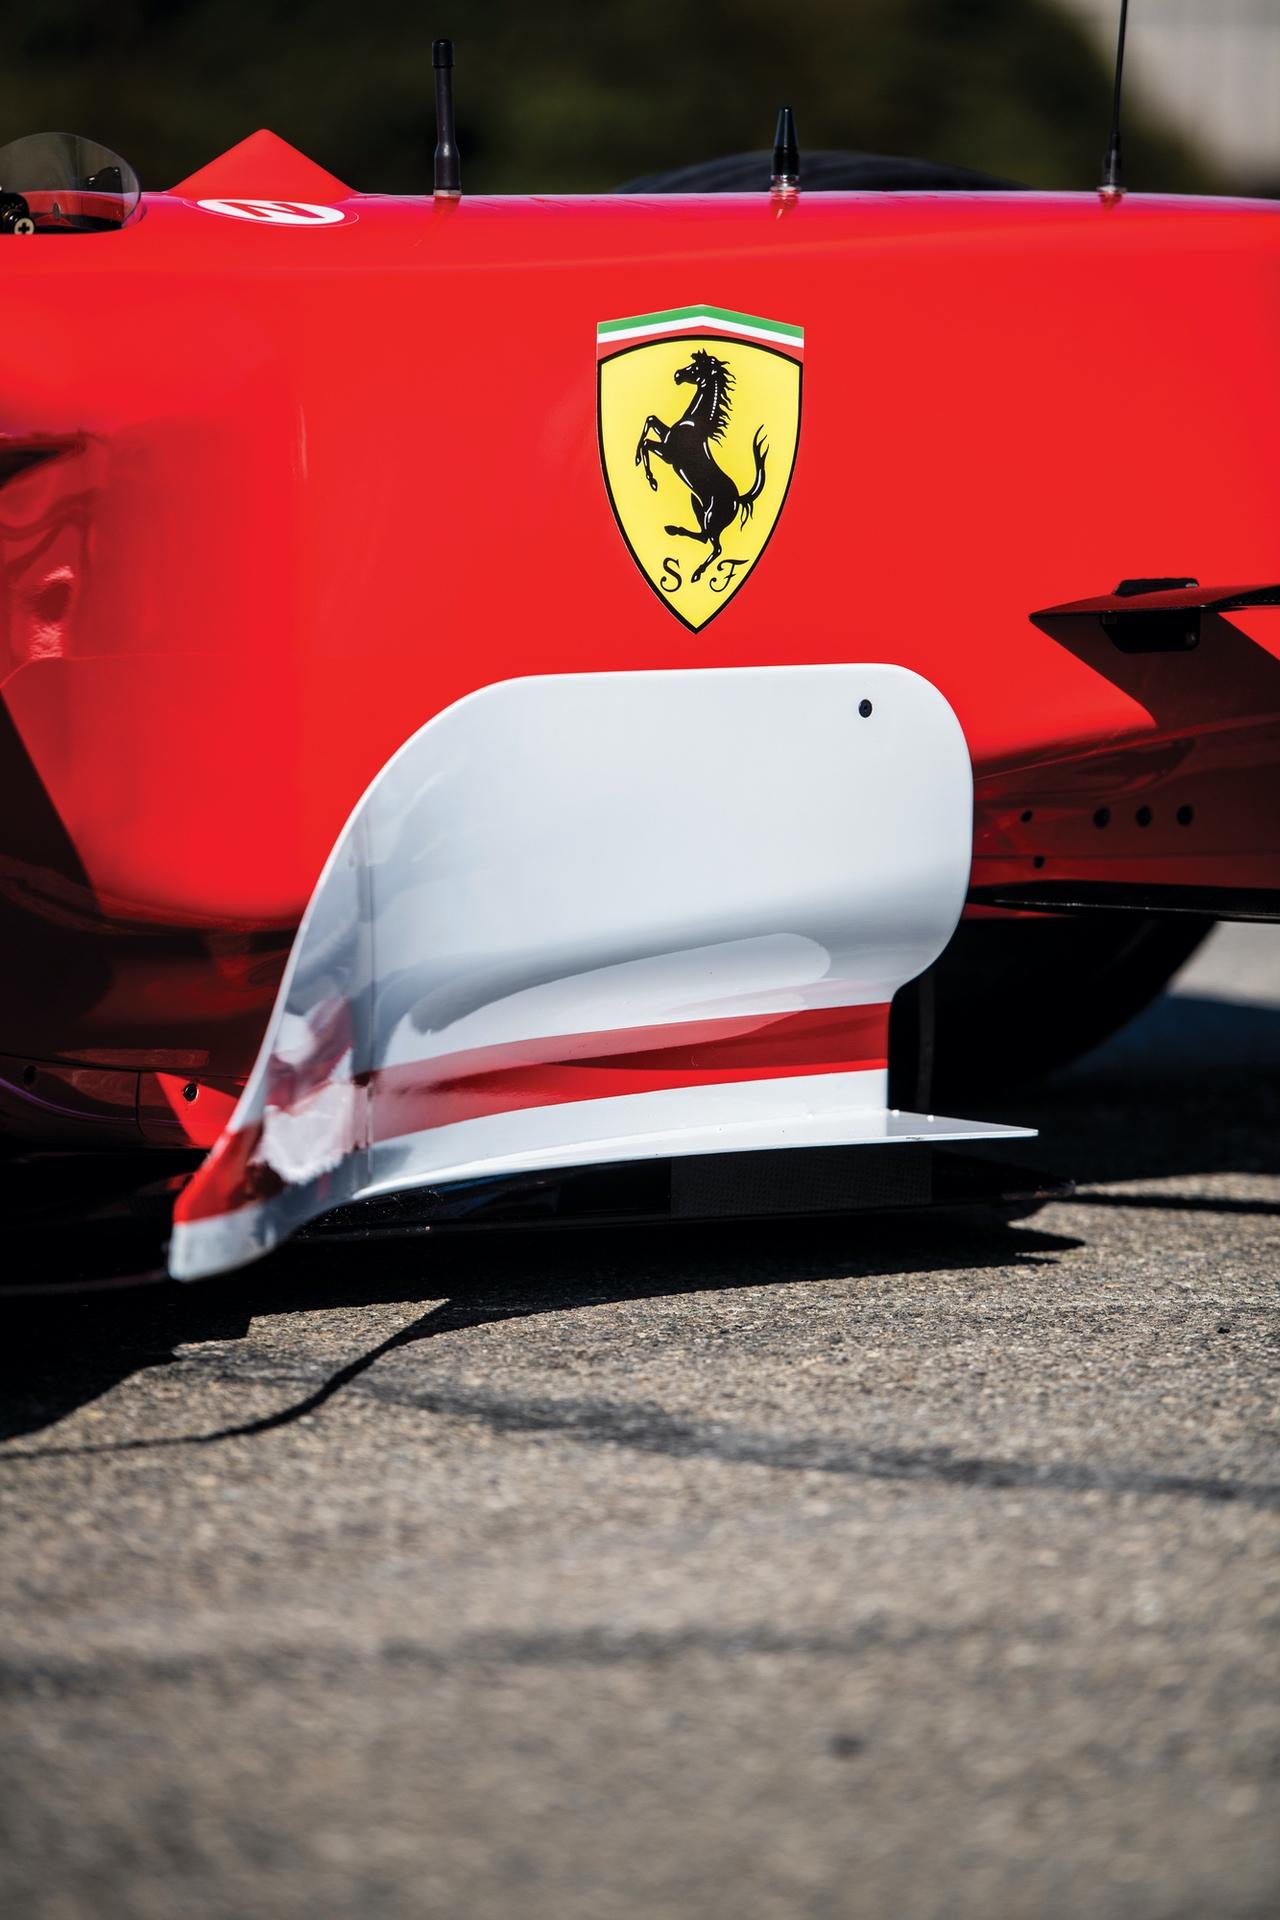 Mick_Schumacher_Ferrari_F2002_0048